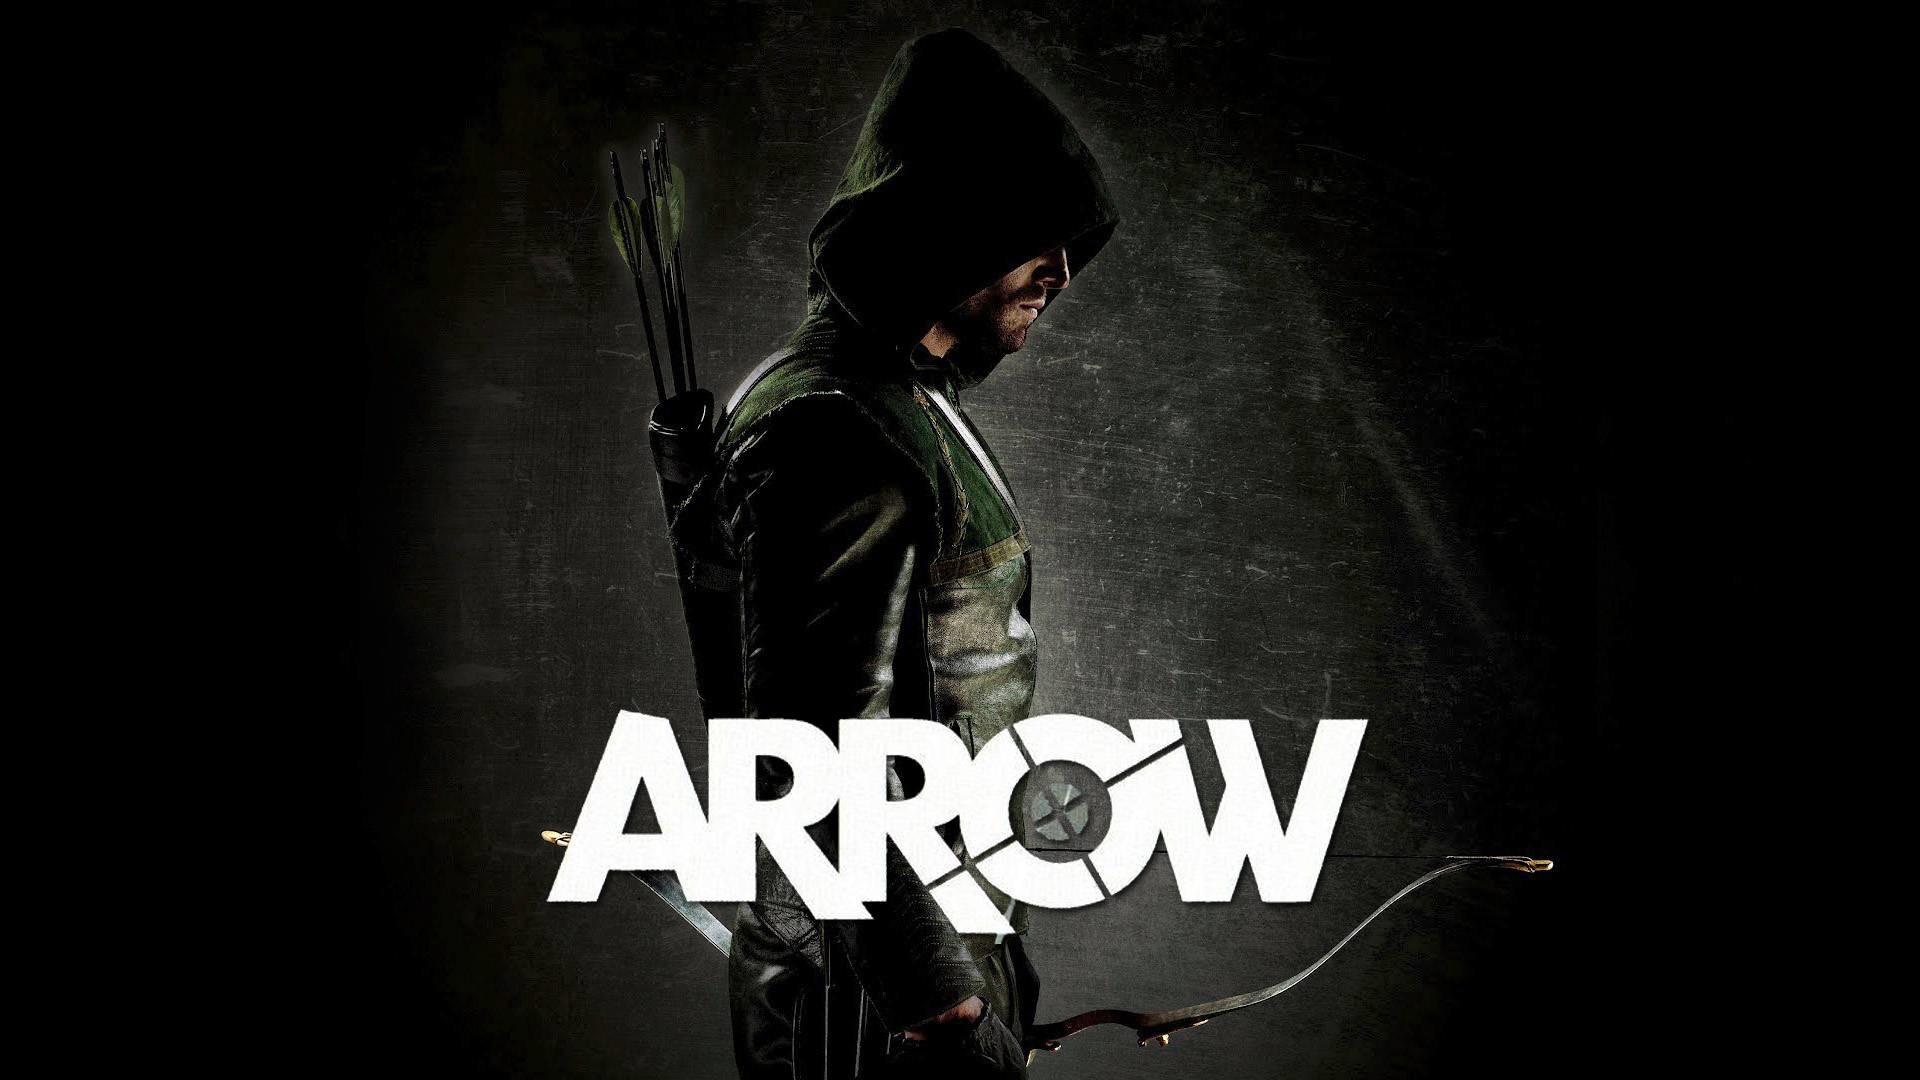 Arrow Wallpaper